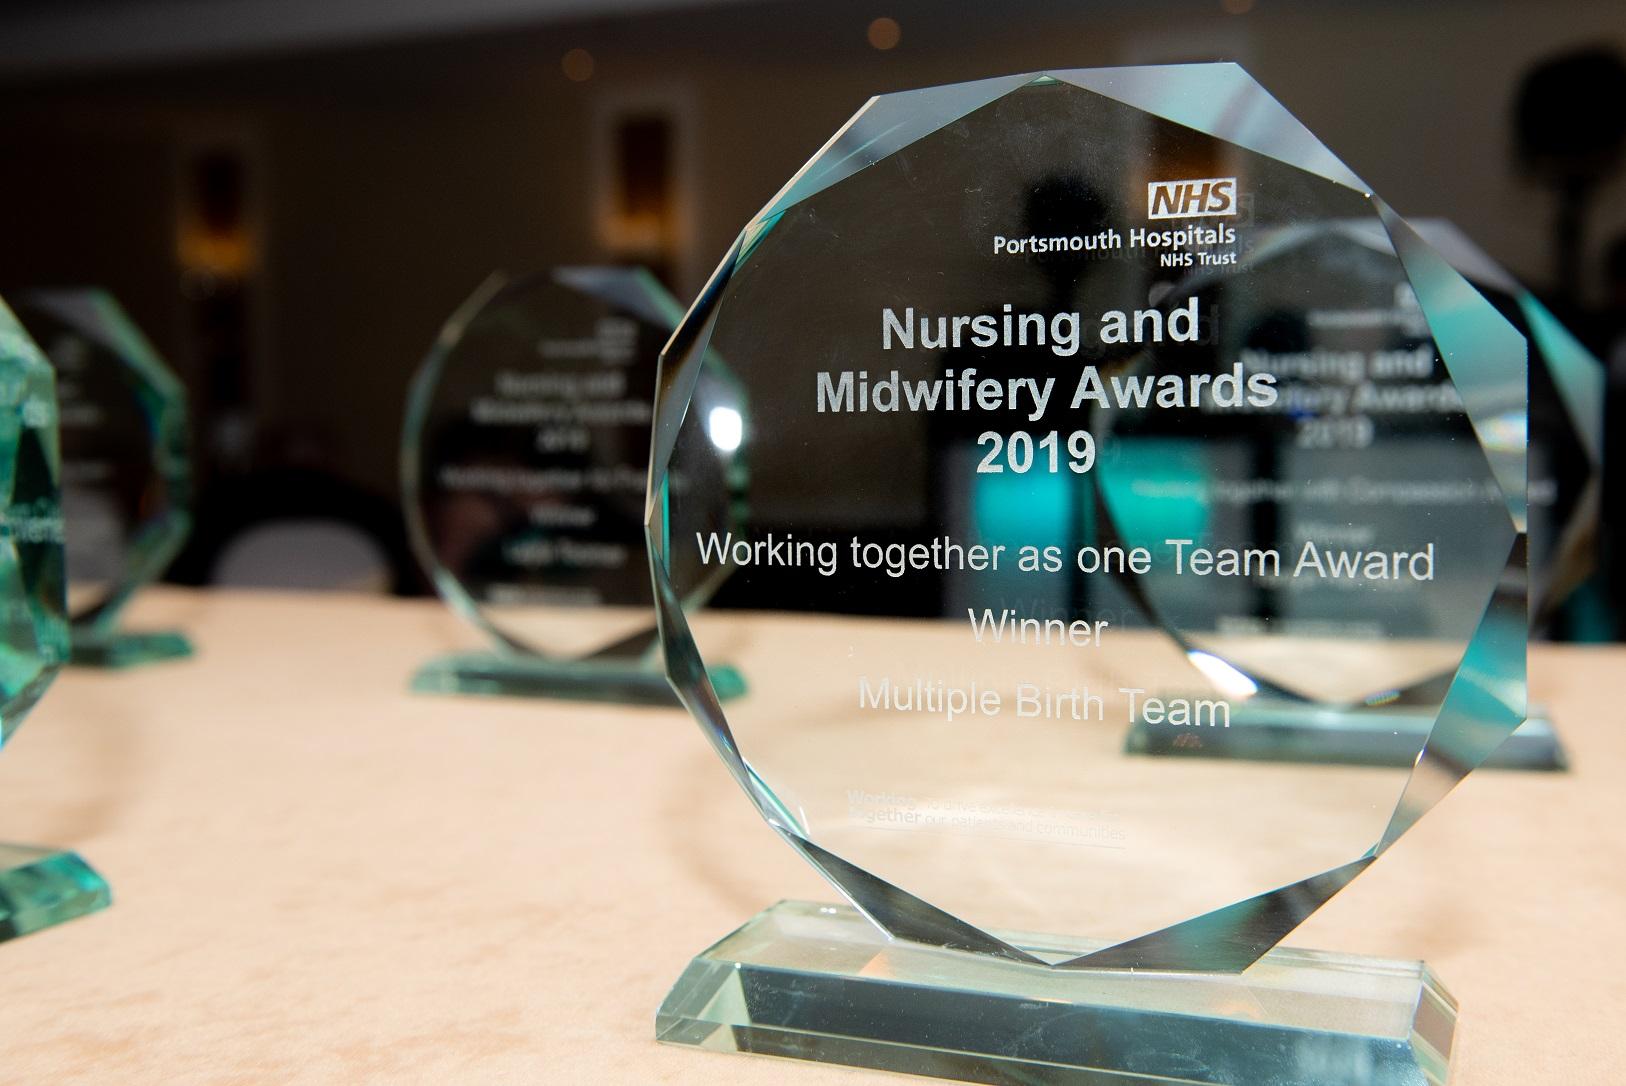 Celebration at Nursing and Midwifery Awards evening